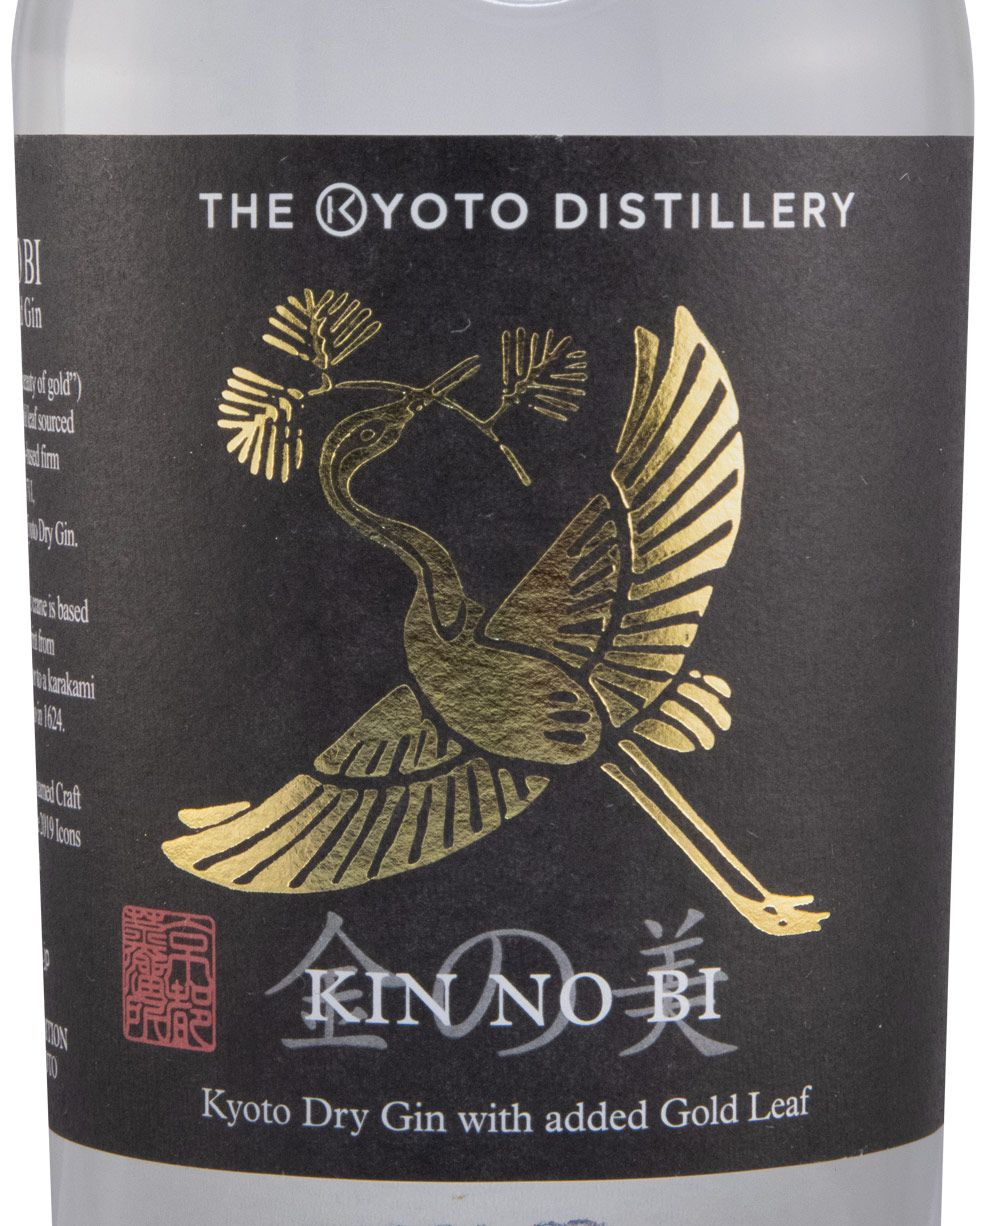 Gin Kin No Bi Kyoto Gold Leaf